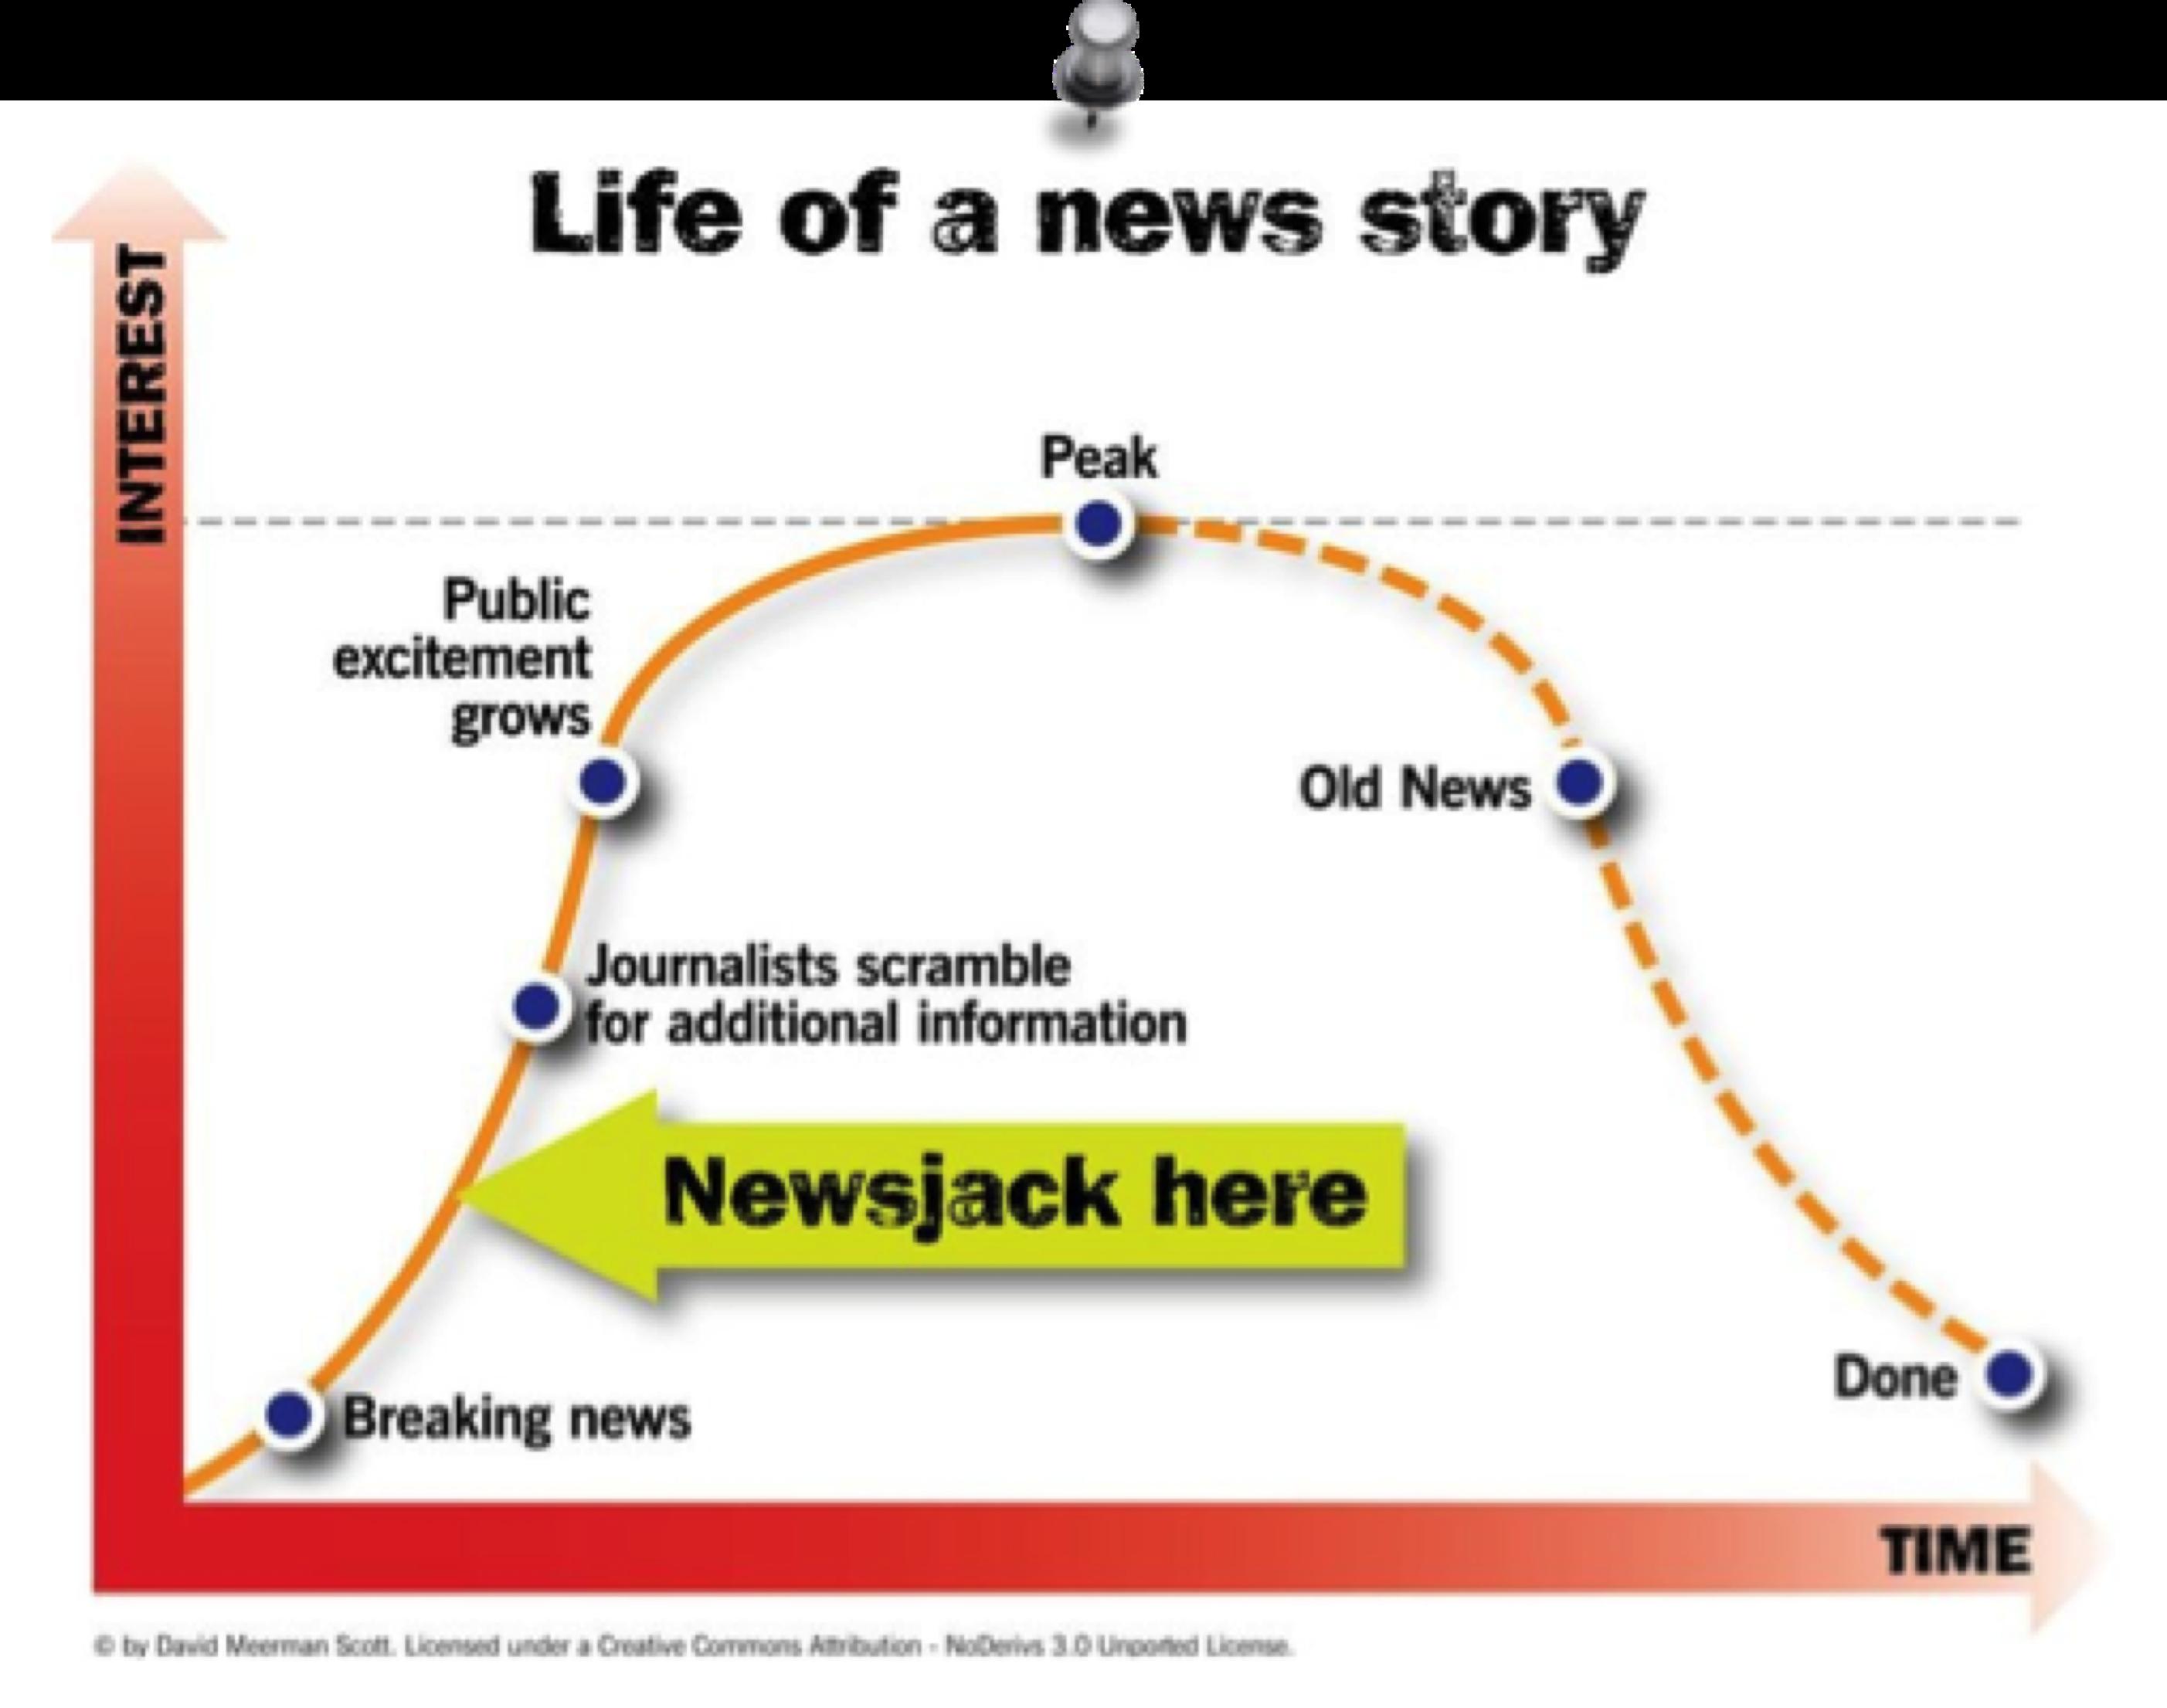 newsjacking_Life-of-a-news-story